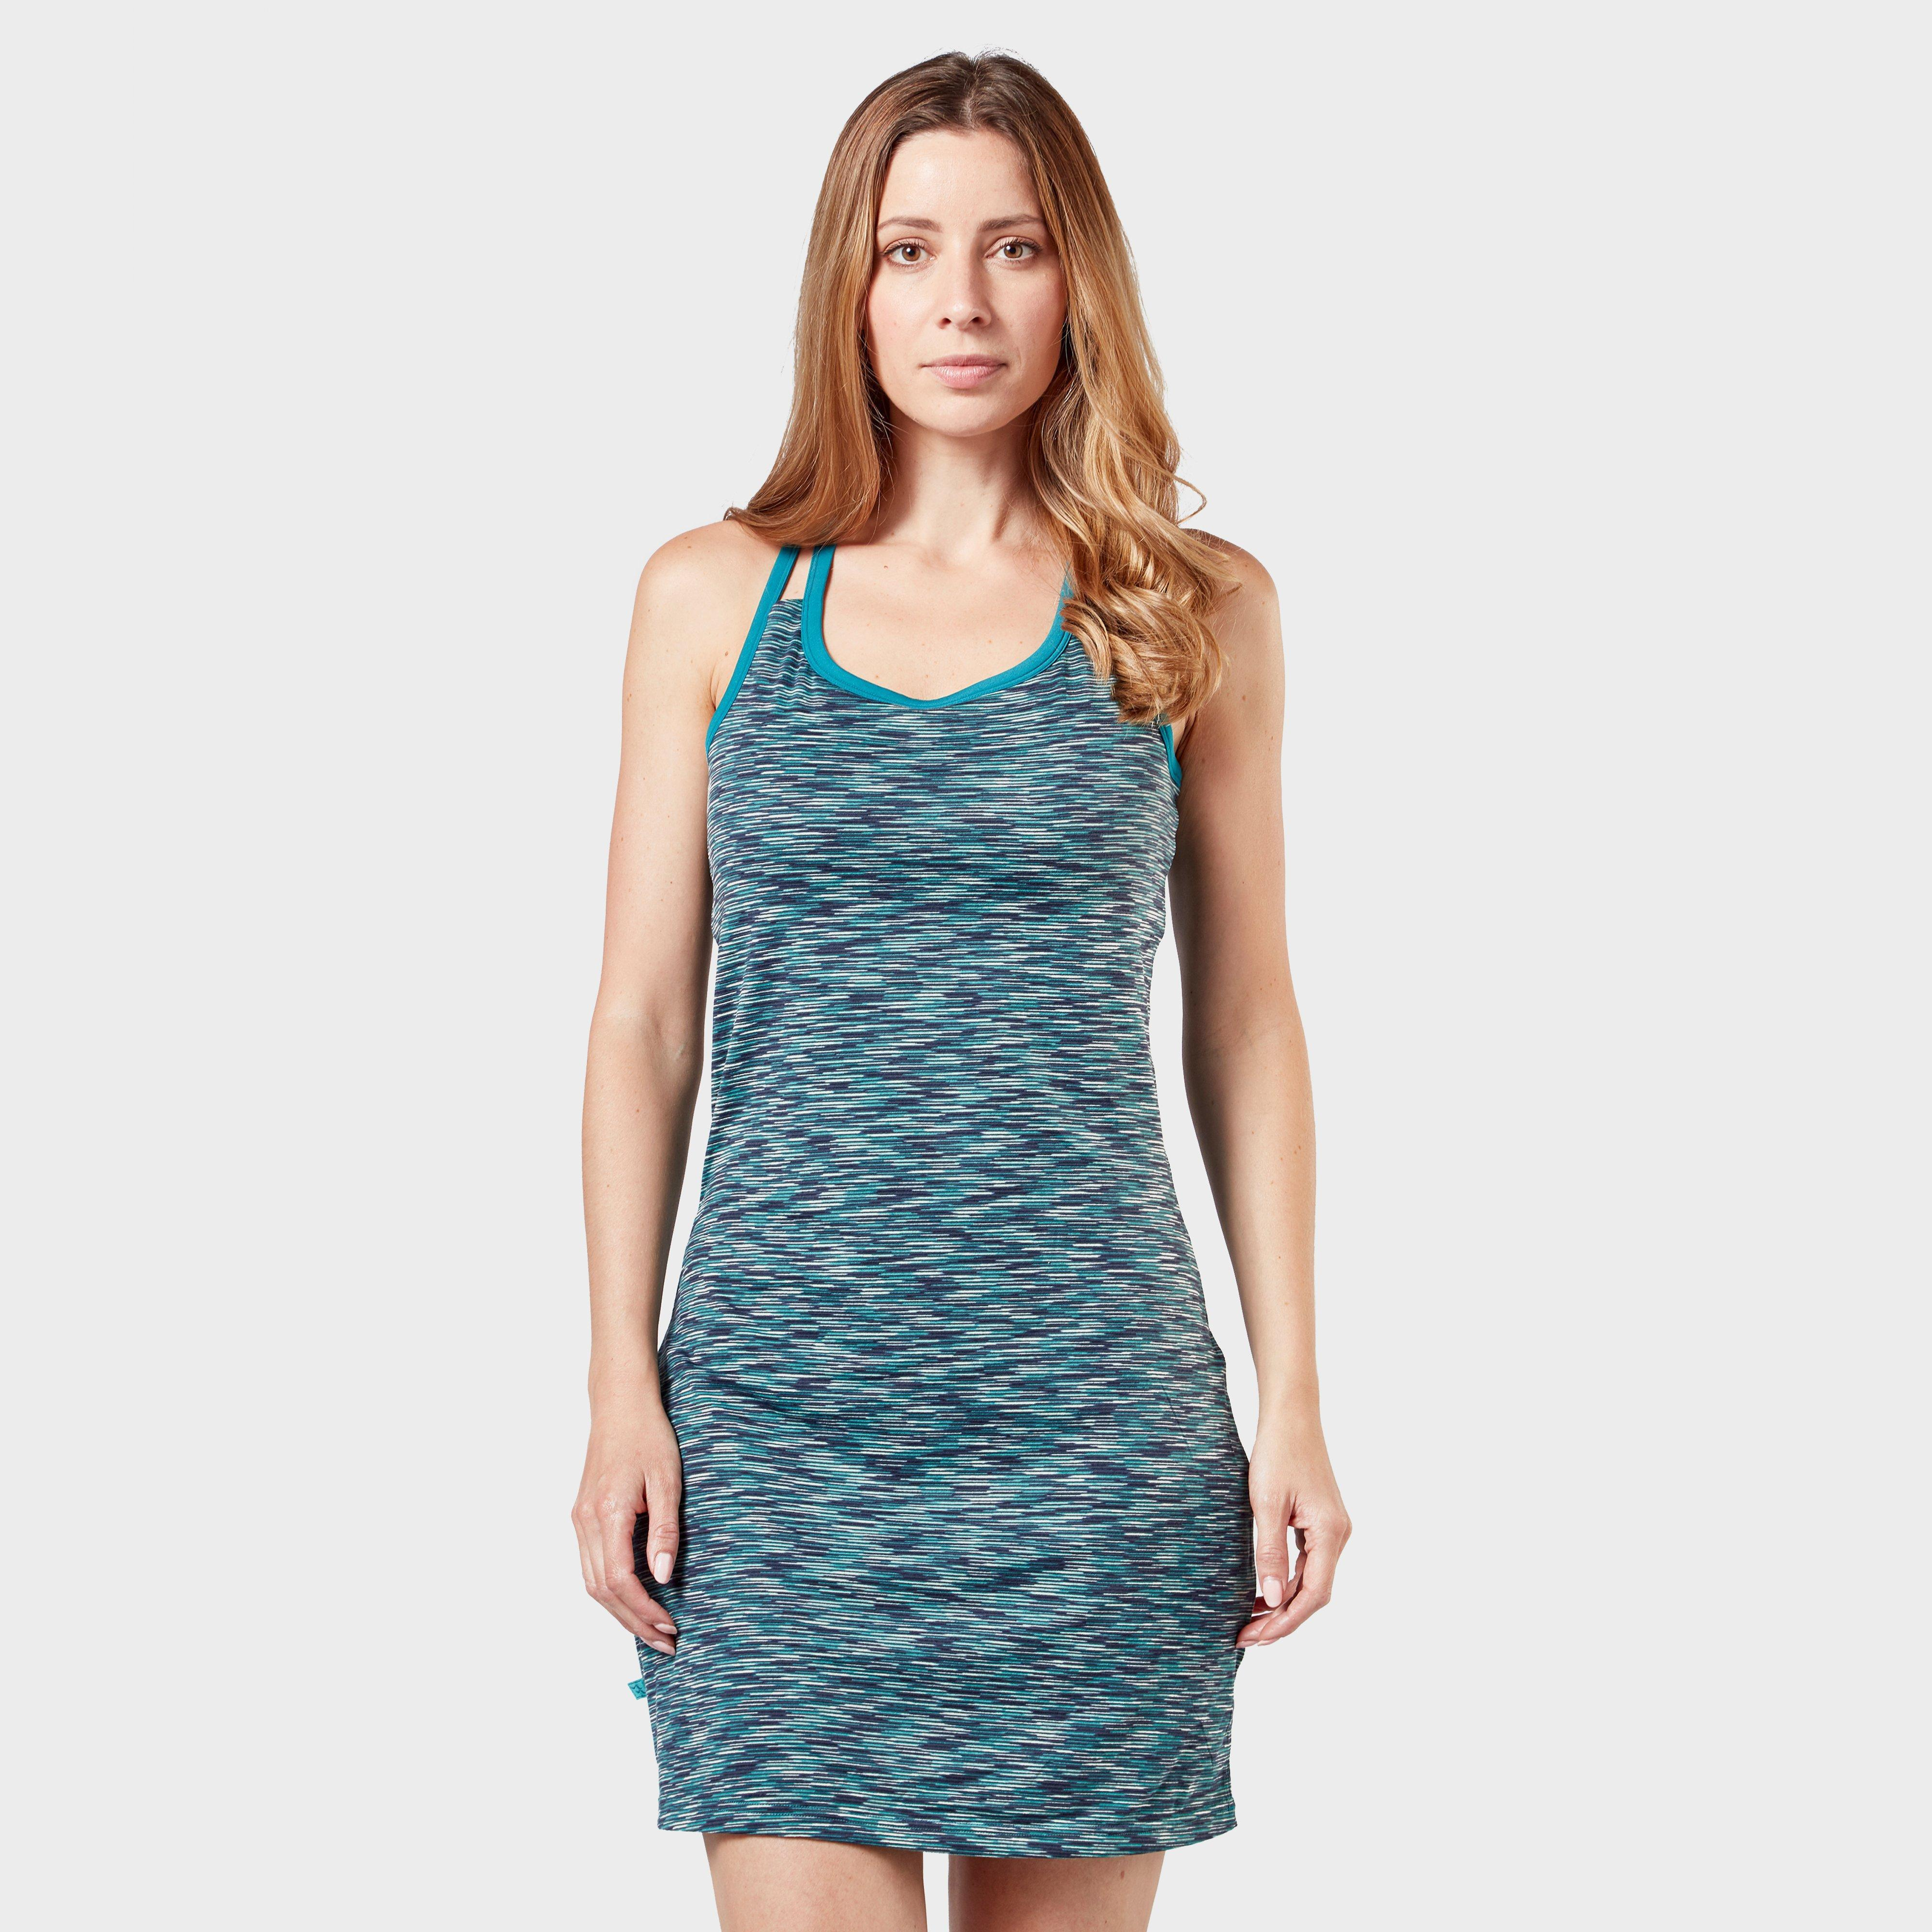 Rab Rab Womens Maze Dress - N/A, N/A